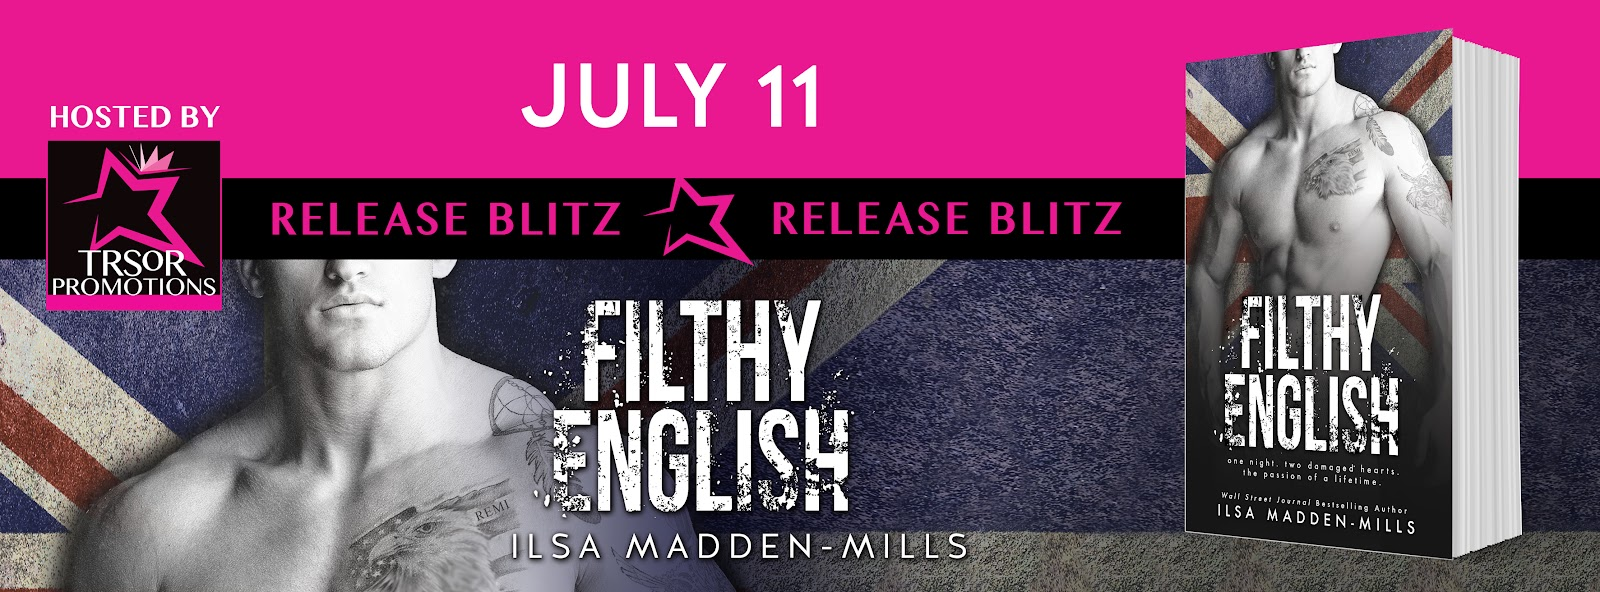 FILTHY_ENGLISH_RELEASE_BLITZ.jpg